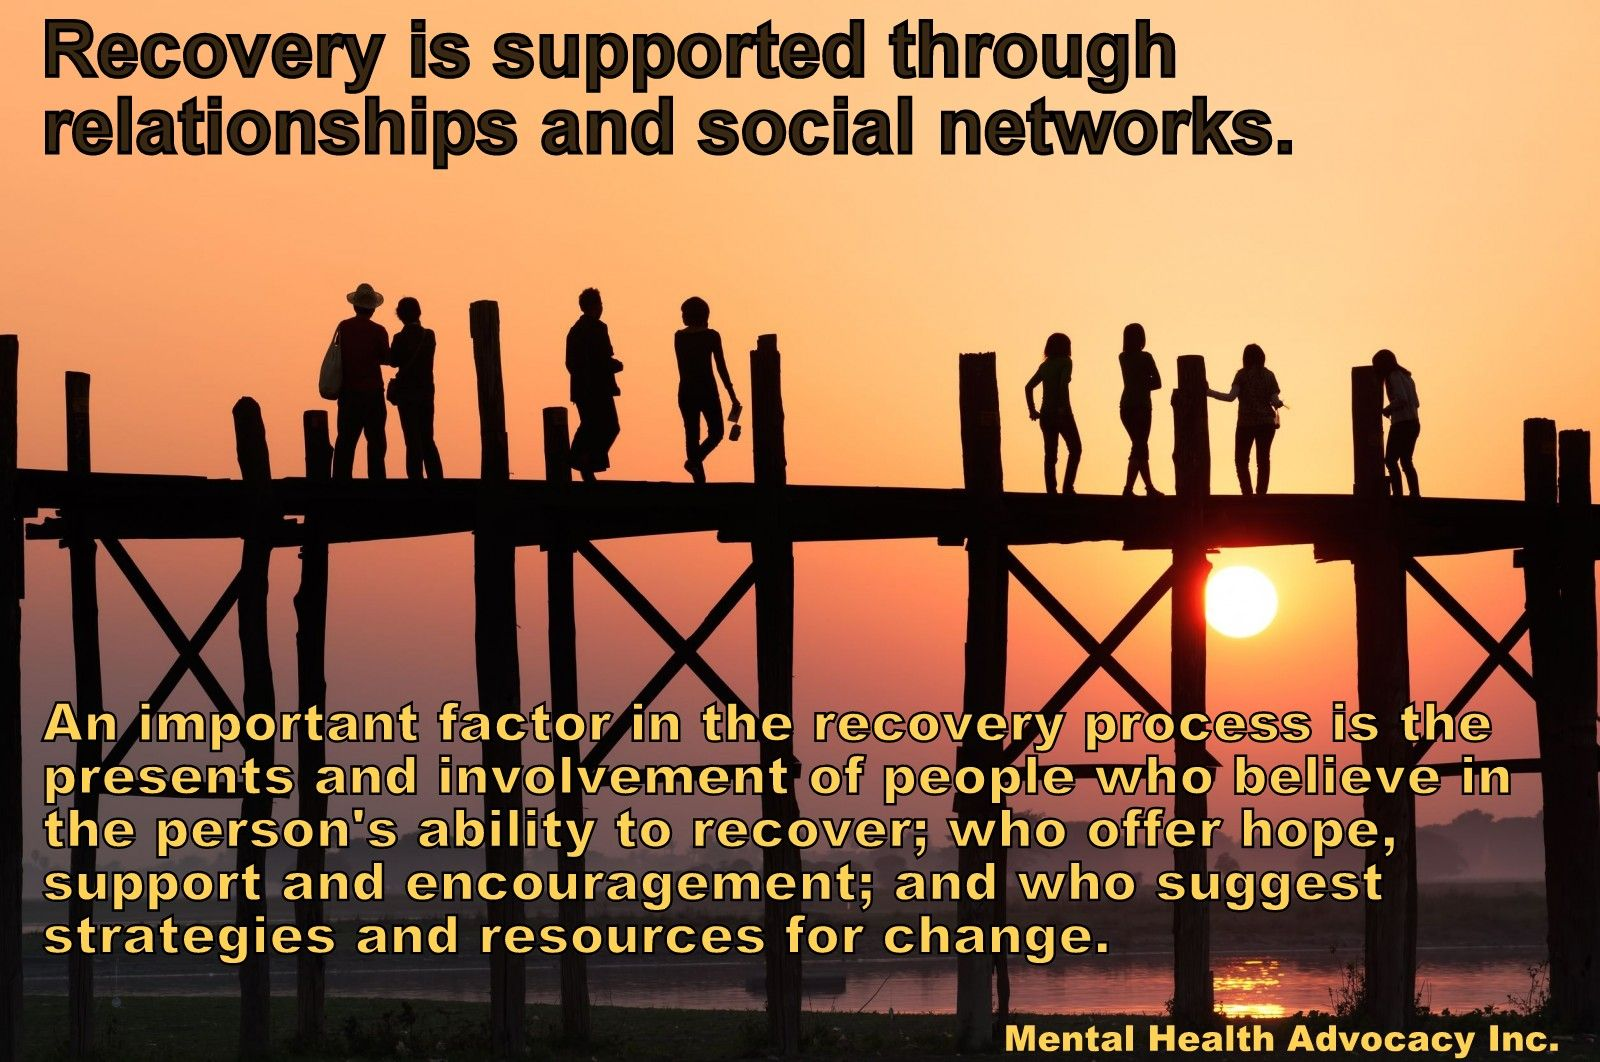 Pin on Mental Health Advocacy Inc.